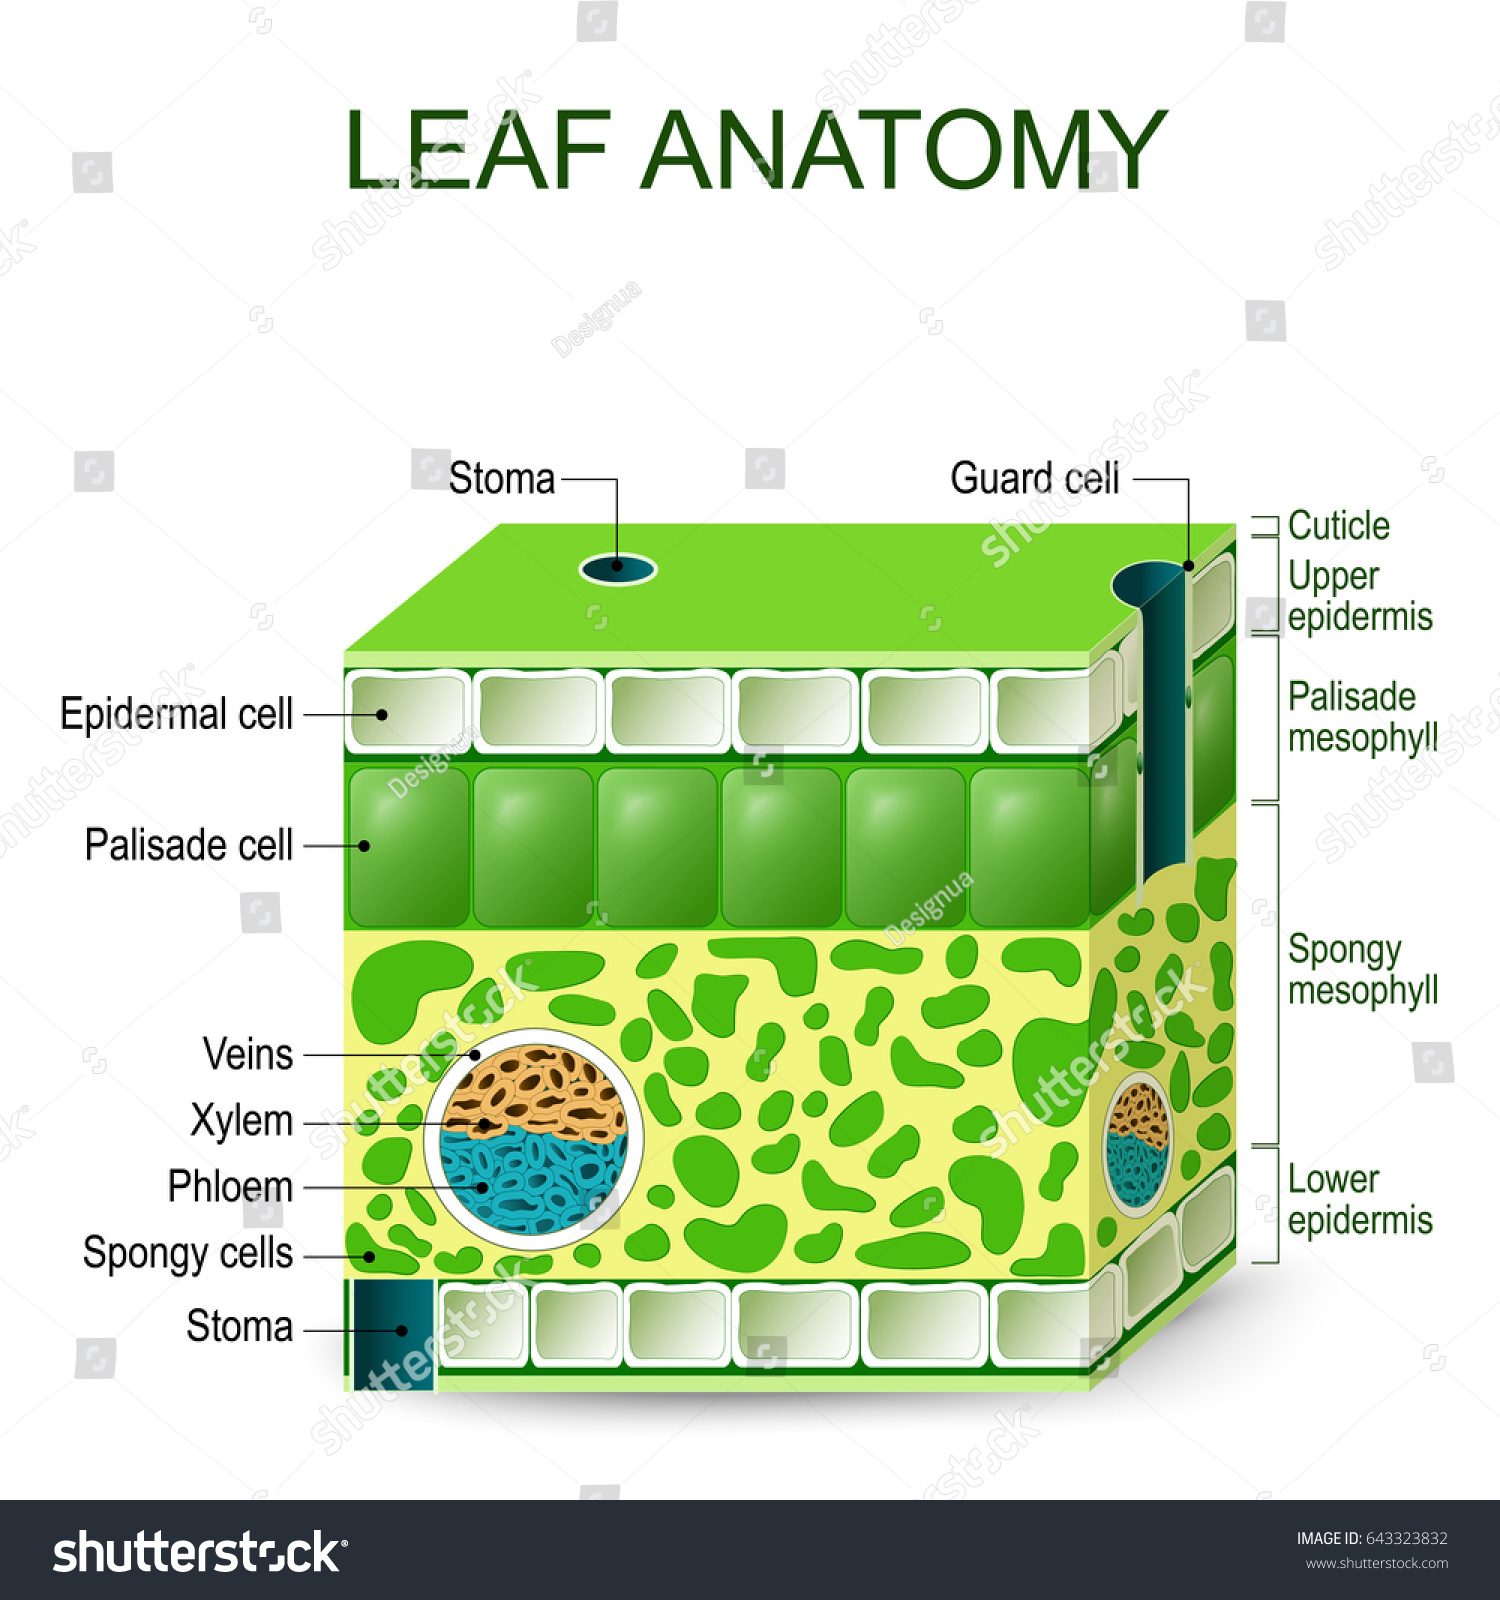 Leaf Anatomy Diagram On White Background Stockillustration 643323832